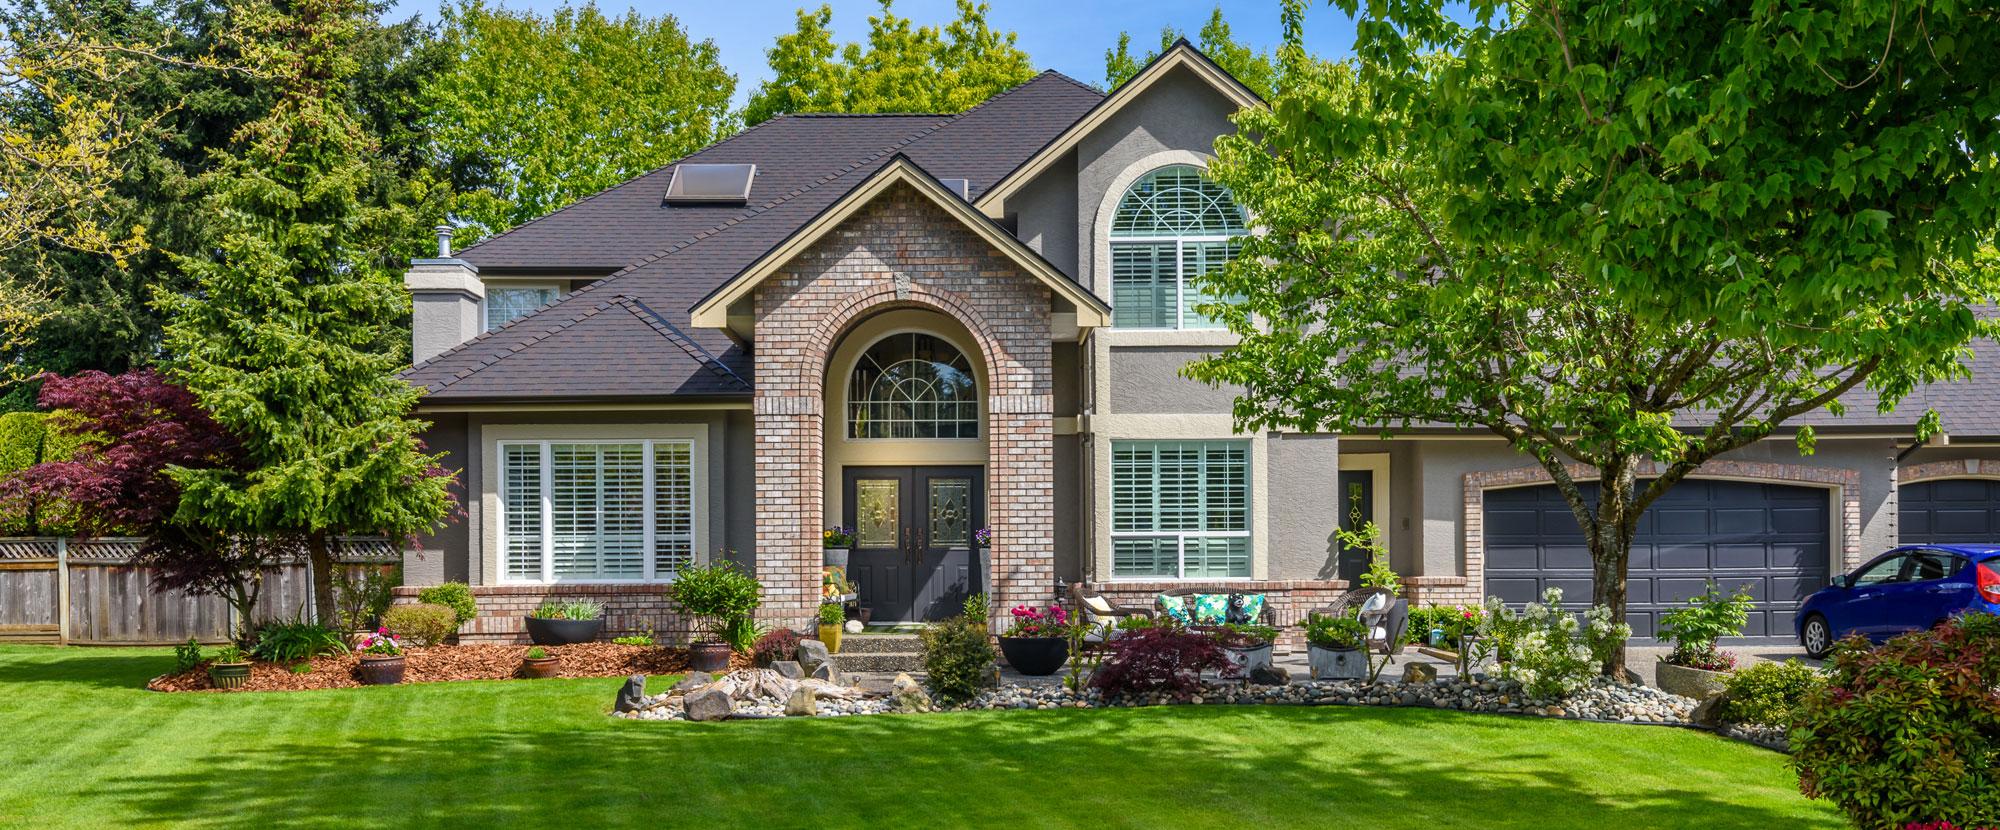 Low Cost Auto Home Life Flood Insurance Abilene Tx Tatum